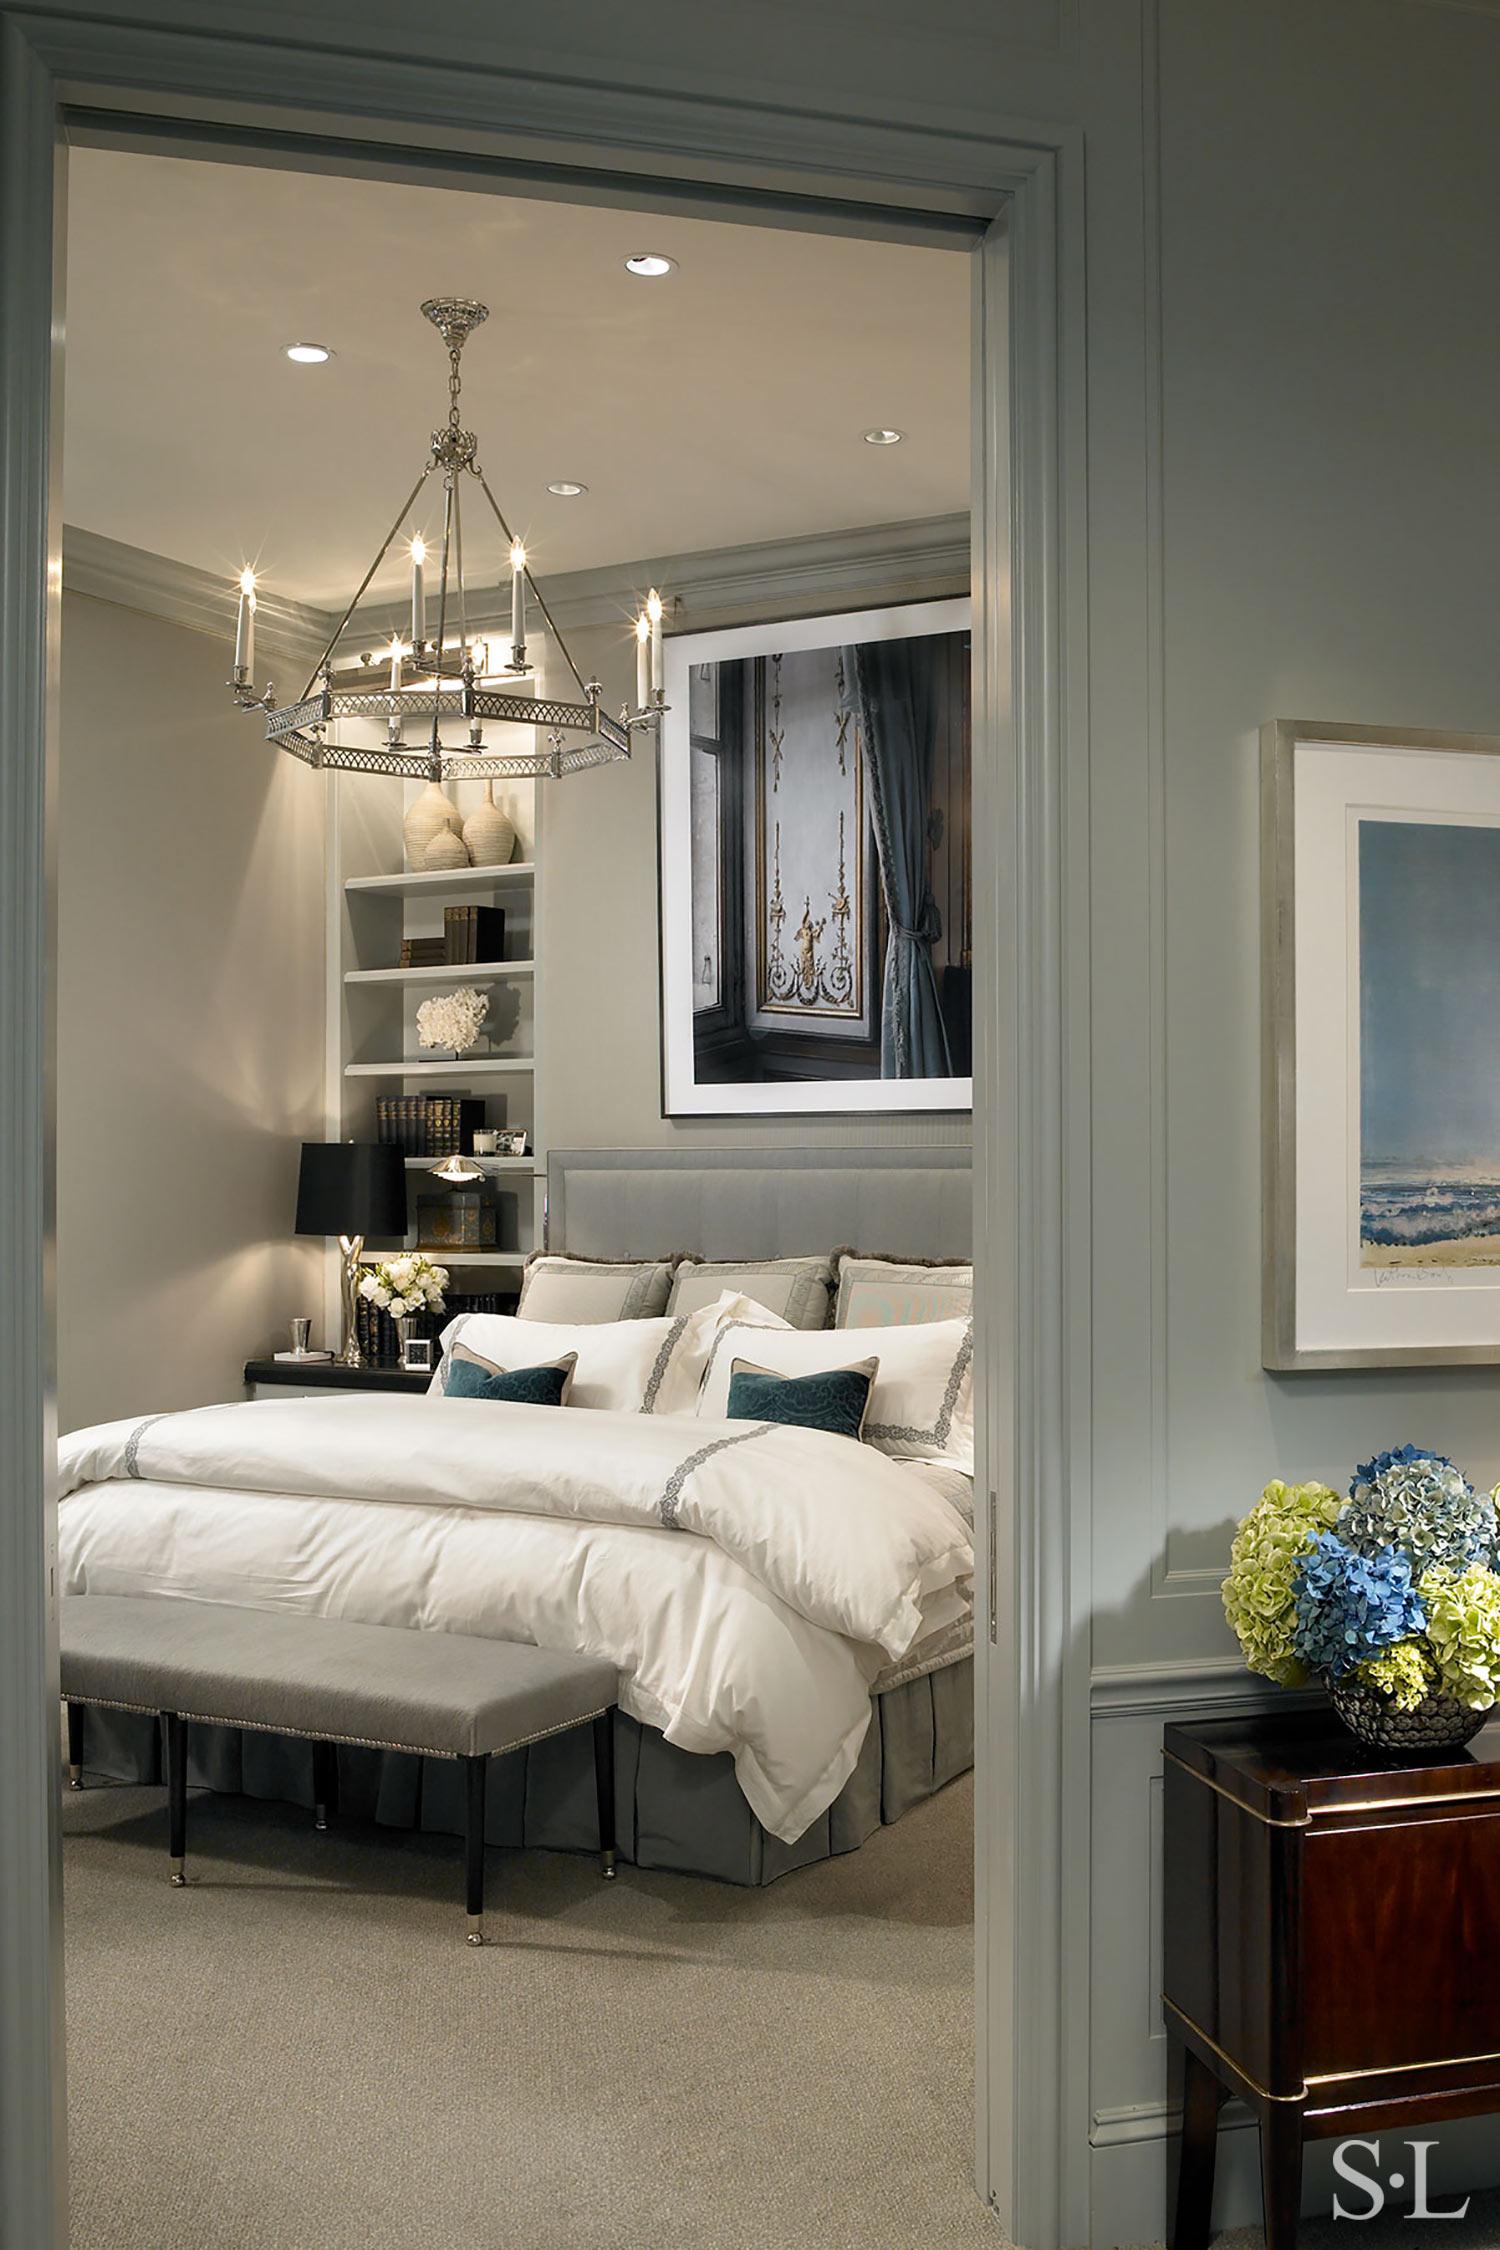 custom headboard & bedding  Interior Architecture & Design: Suzanne Lovell, Inc.